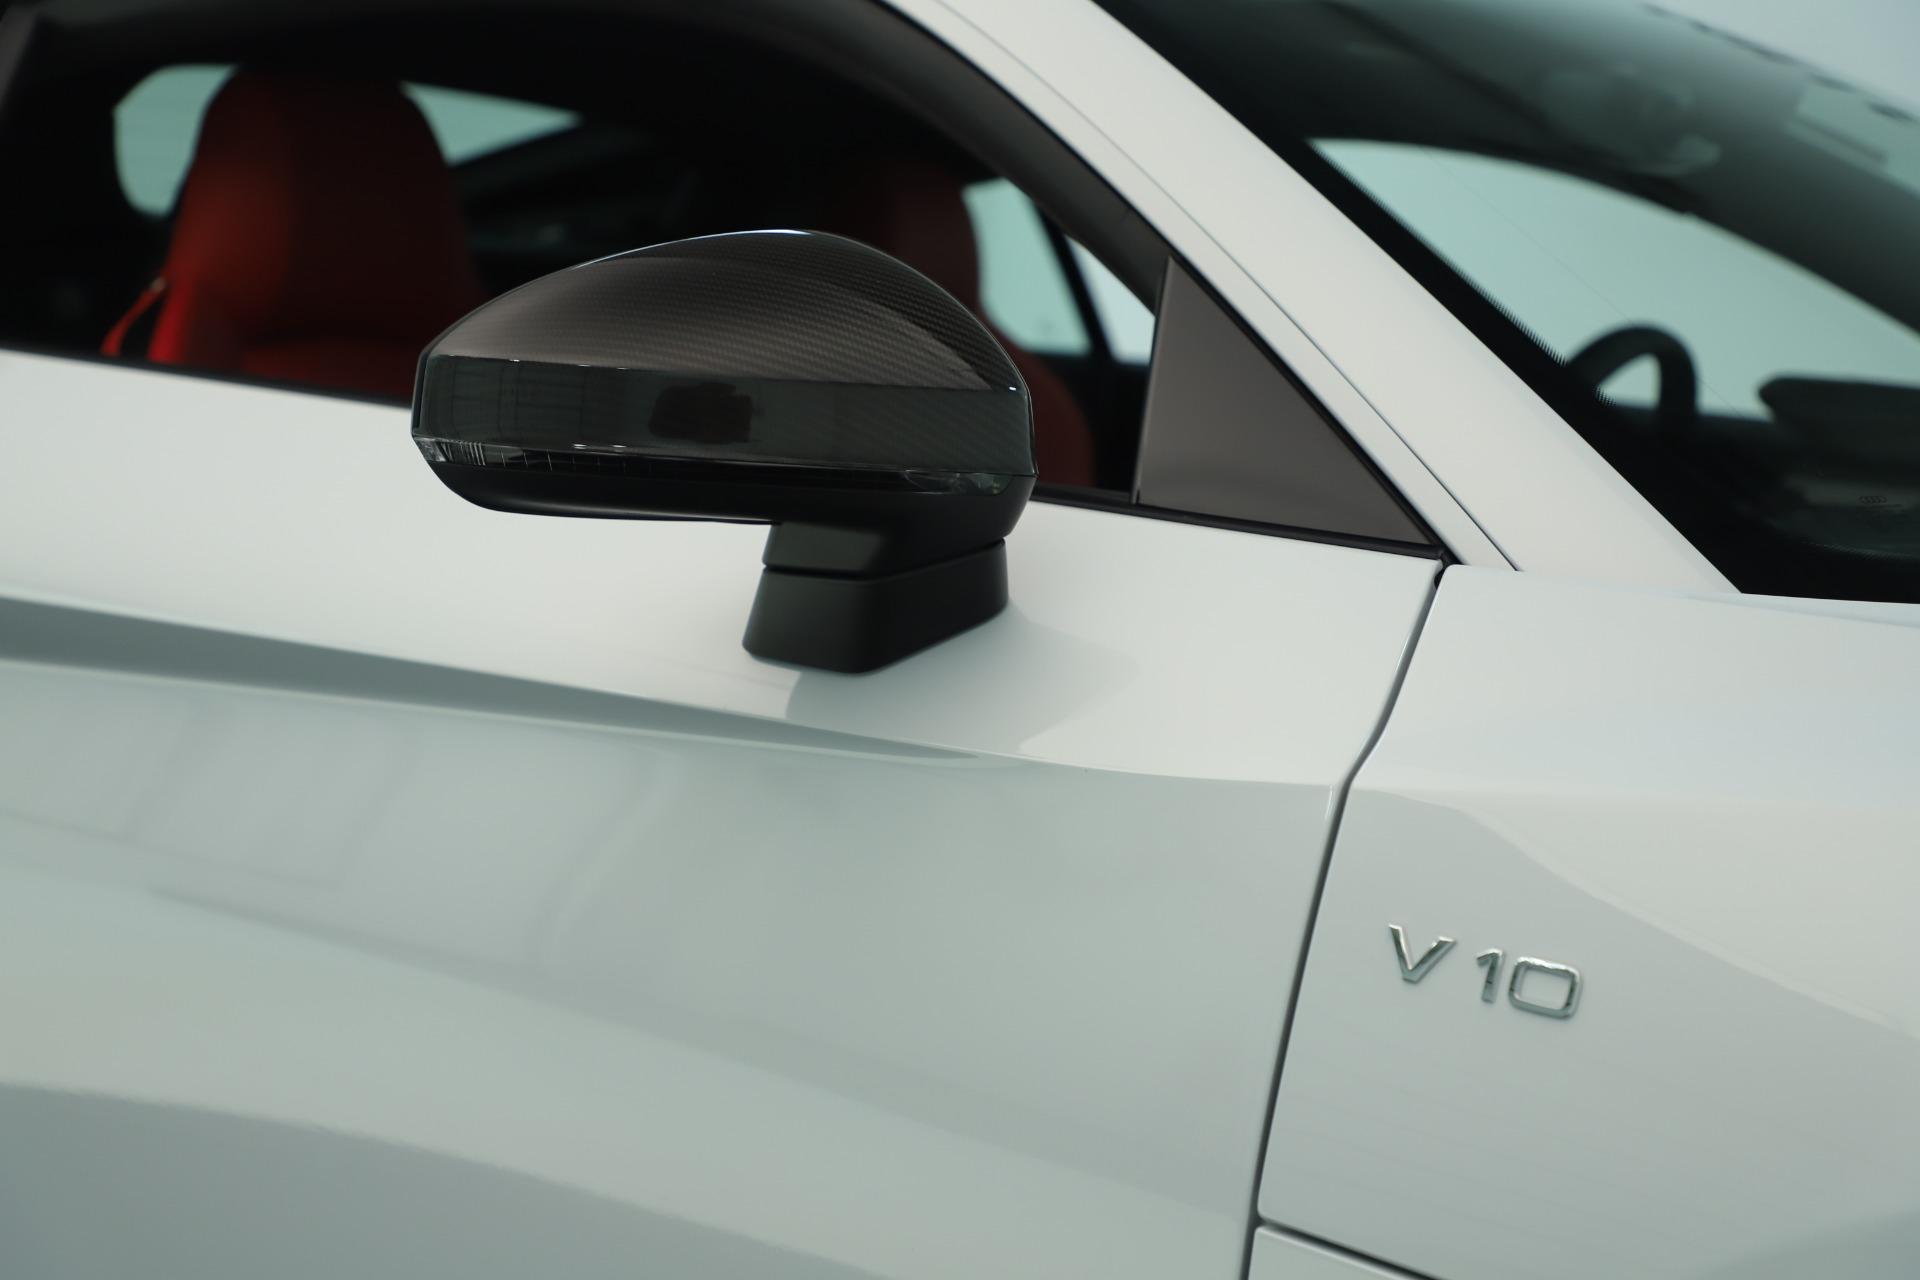 Used 2018 Audi R8 5.2 quattro V10 Plus For Sale In Greenwich, CT 3360_p24